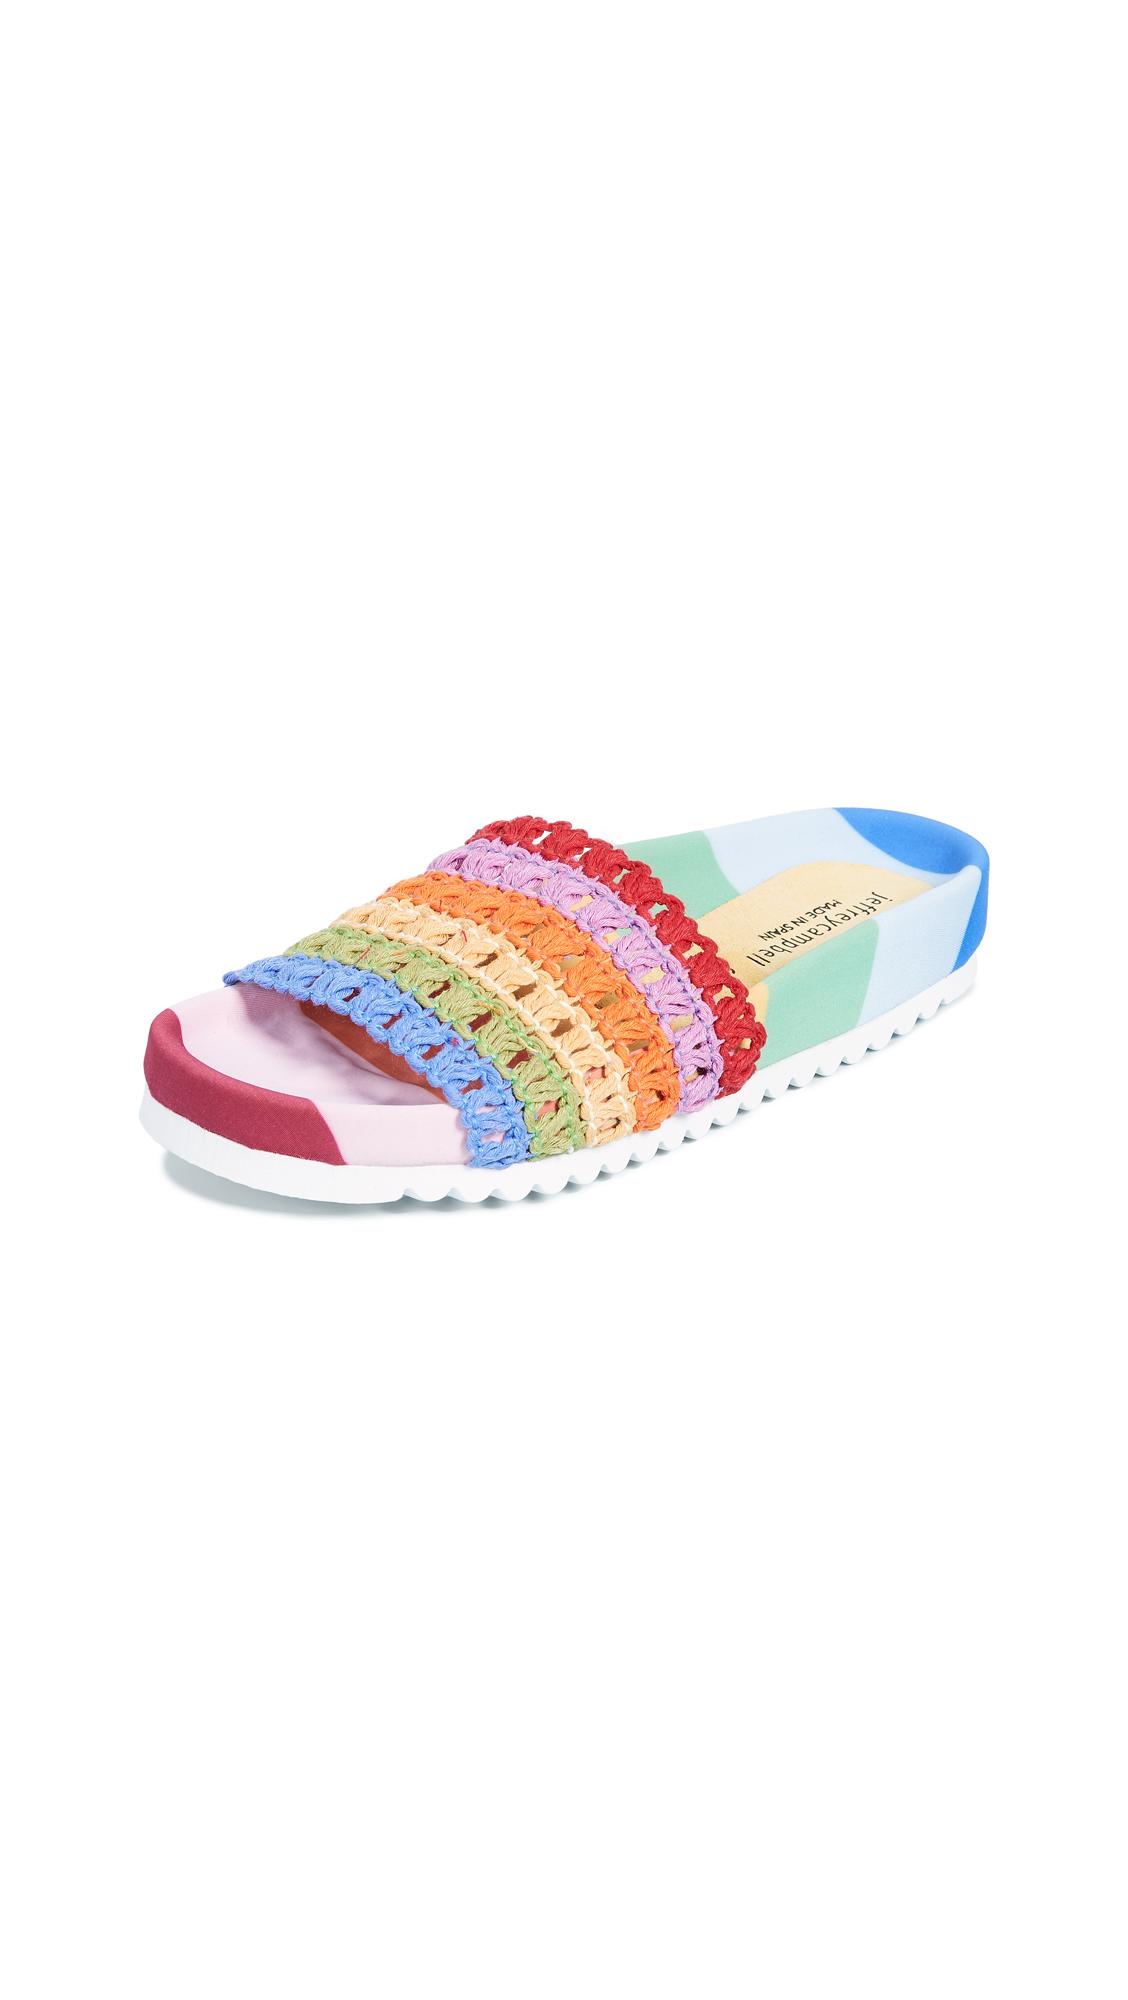 Jeffrey Campbell Coco Rainbow Slides - Rainbow